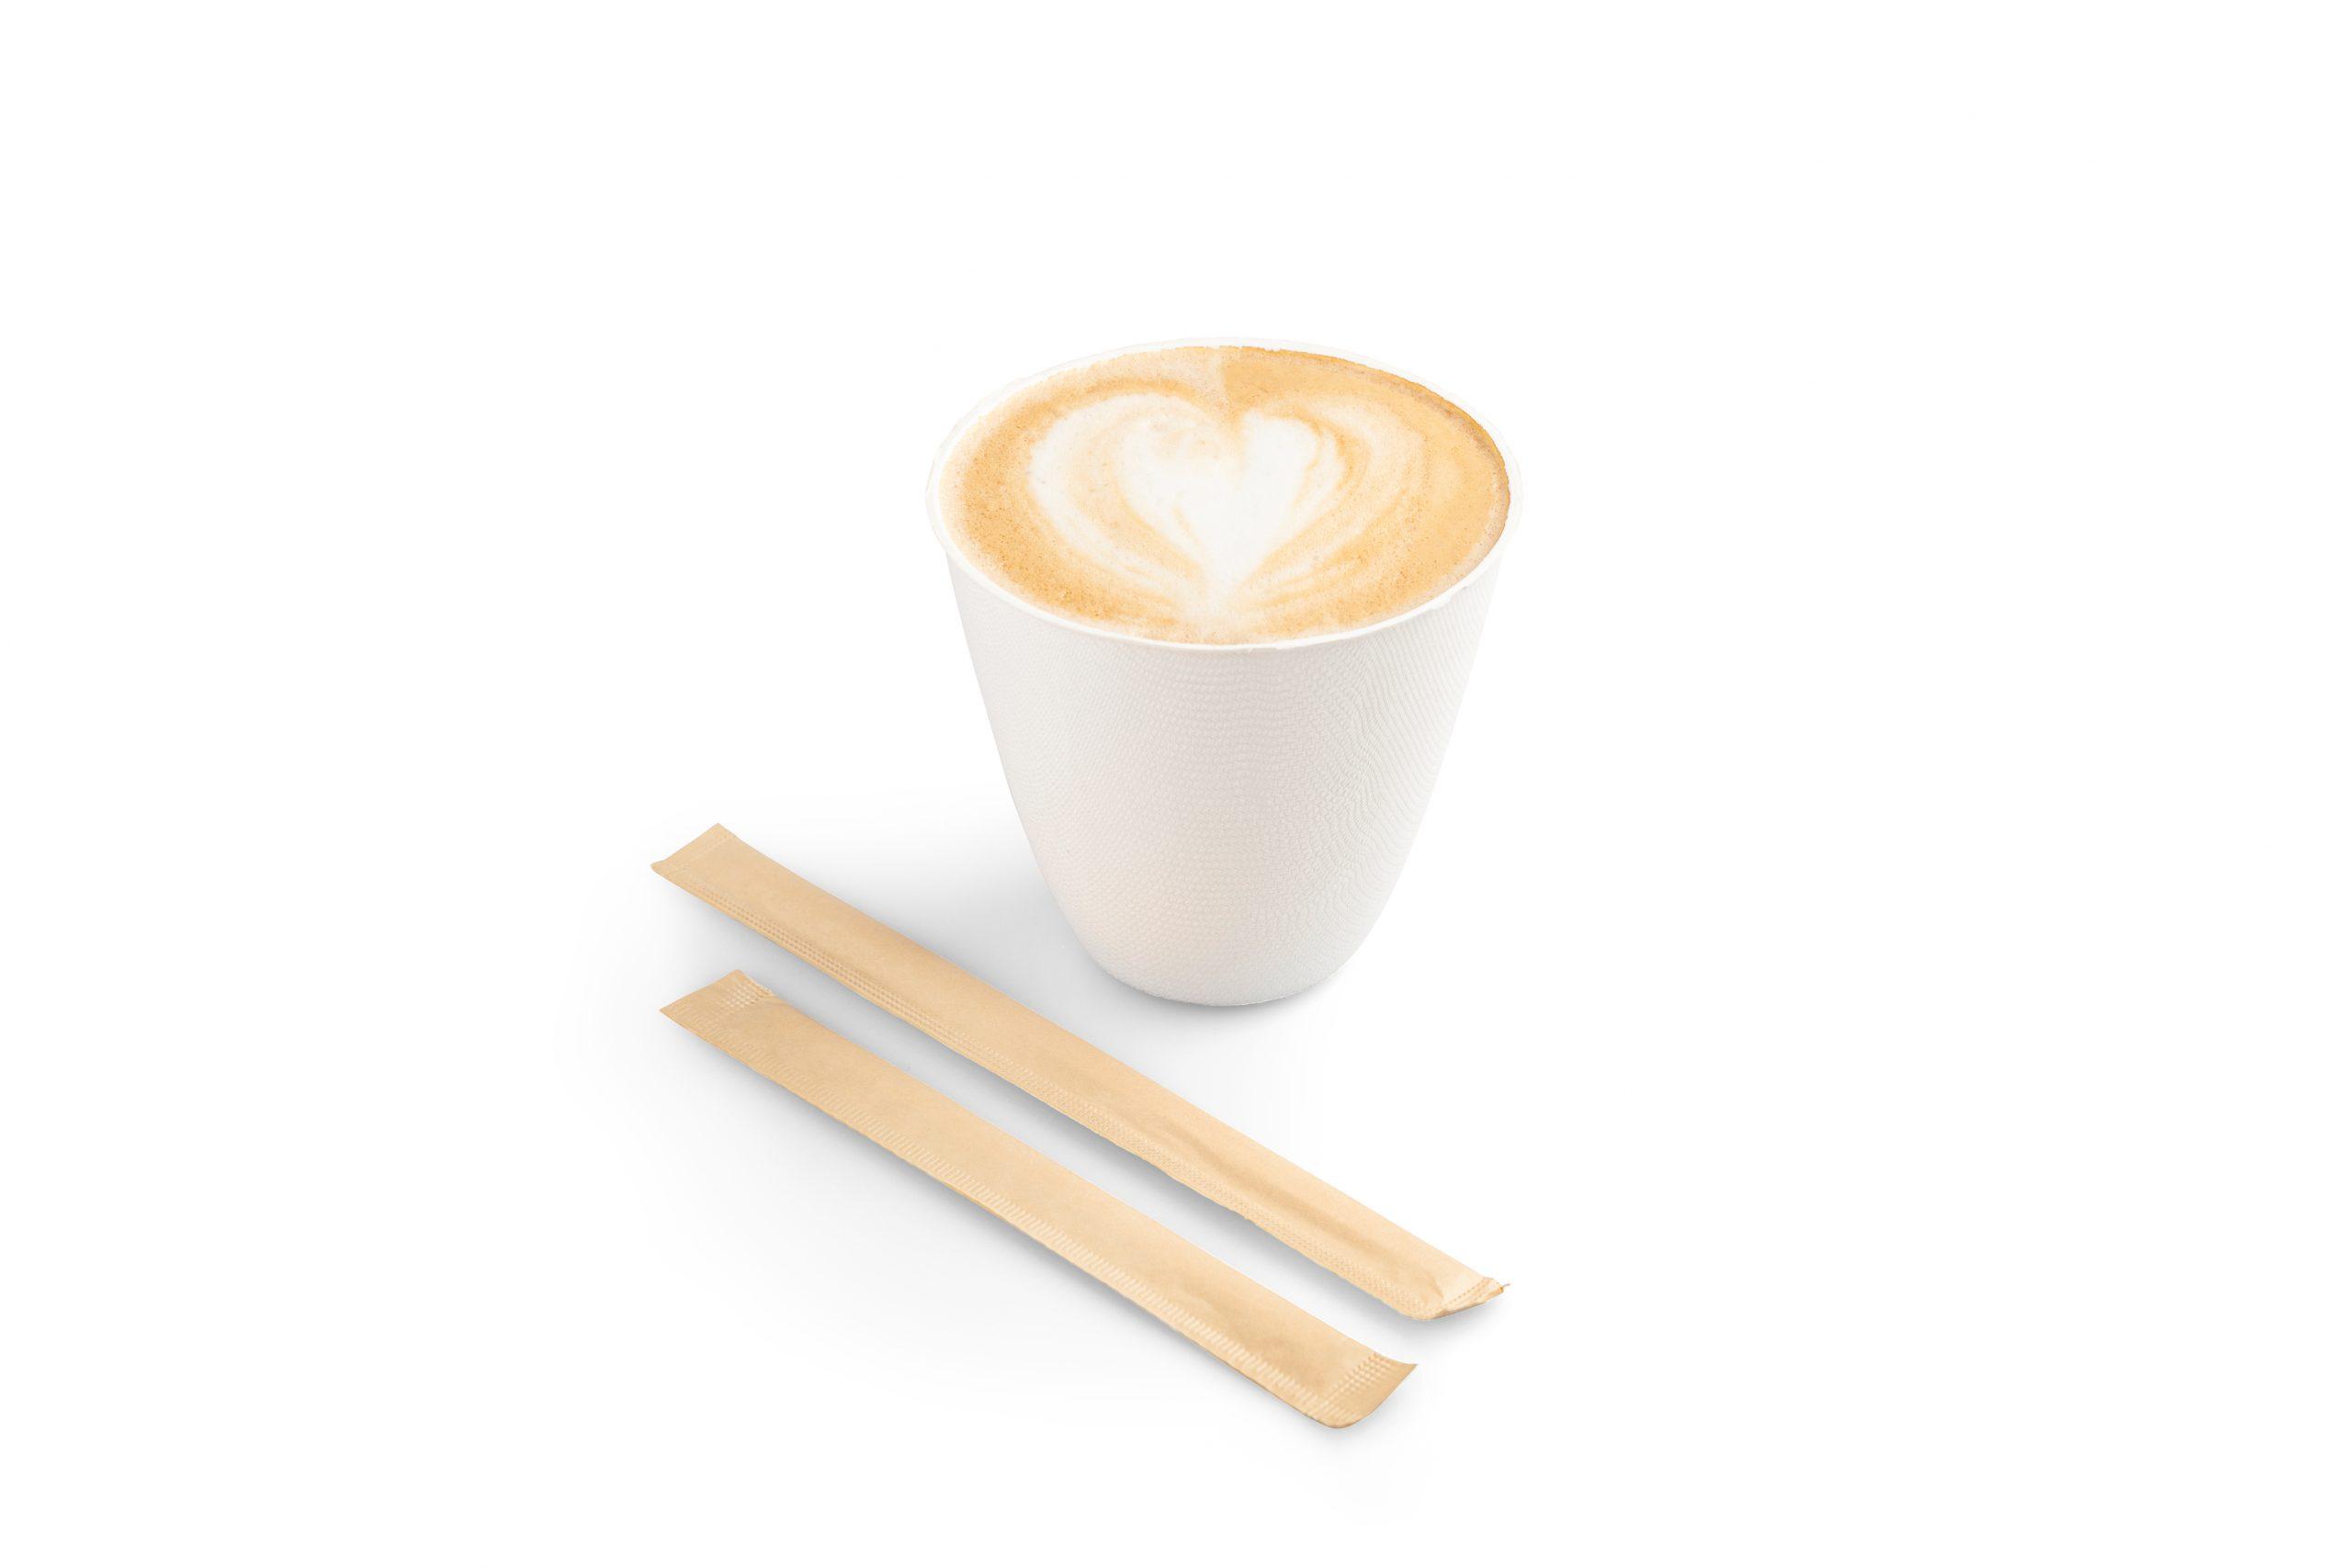 Roerstaafje hout 110 mm (FSC®) per stuk verpakt Sier Disposables